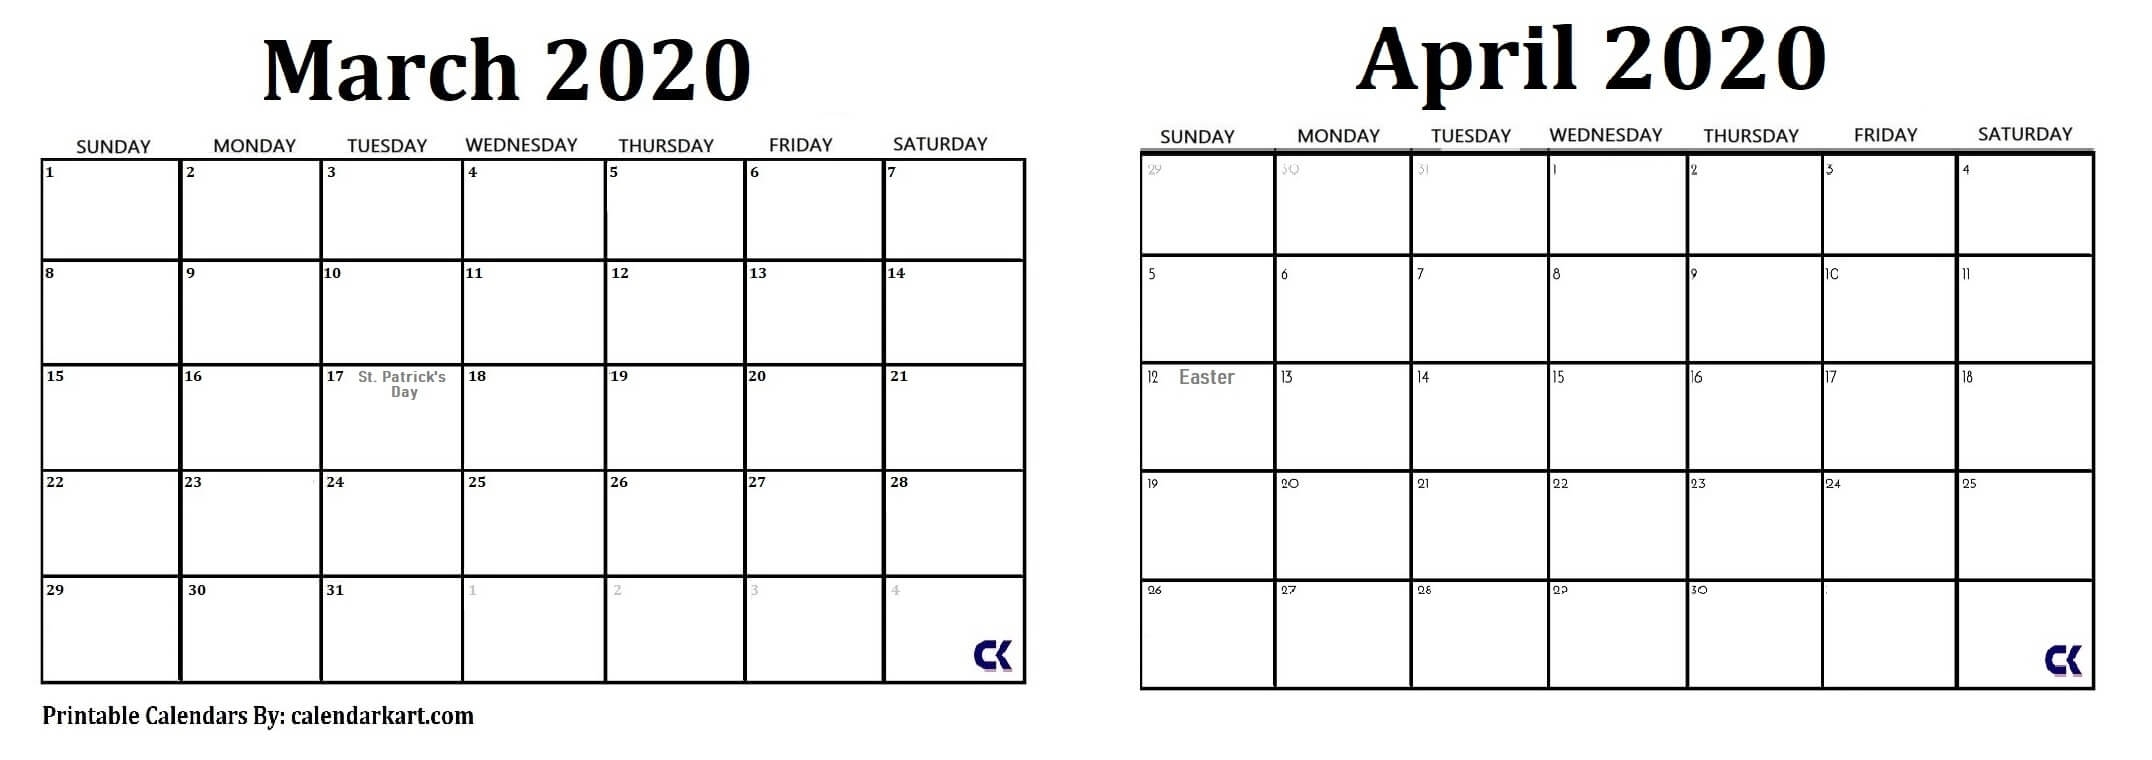 Printable March April 2020 Calendar » Calendarkart